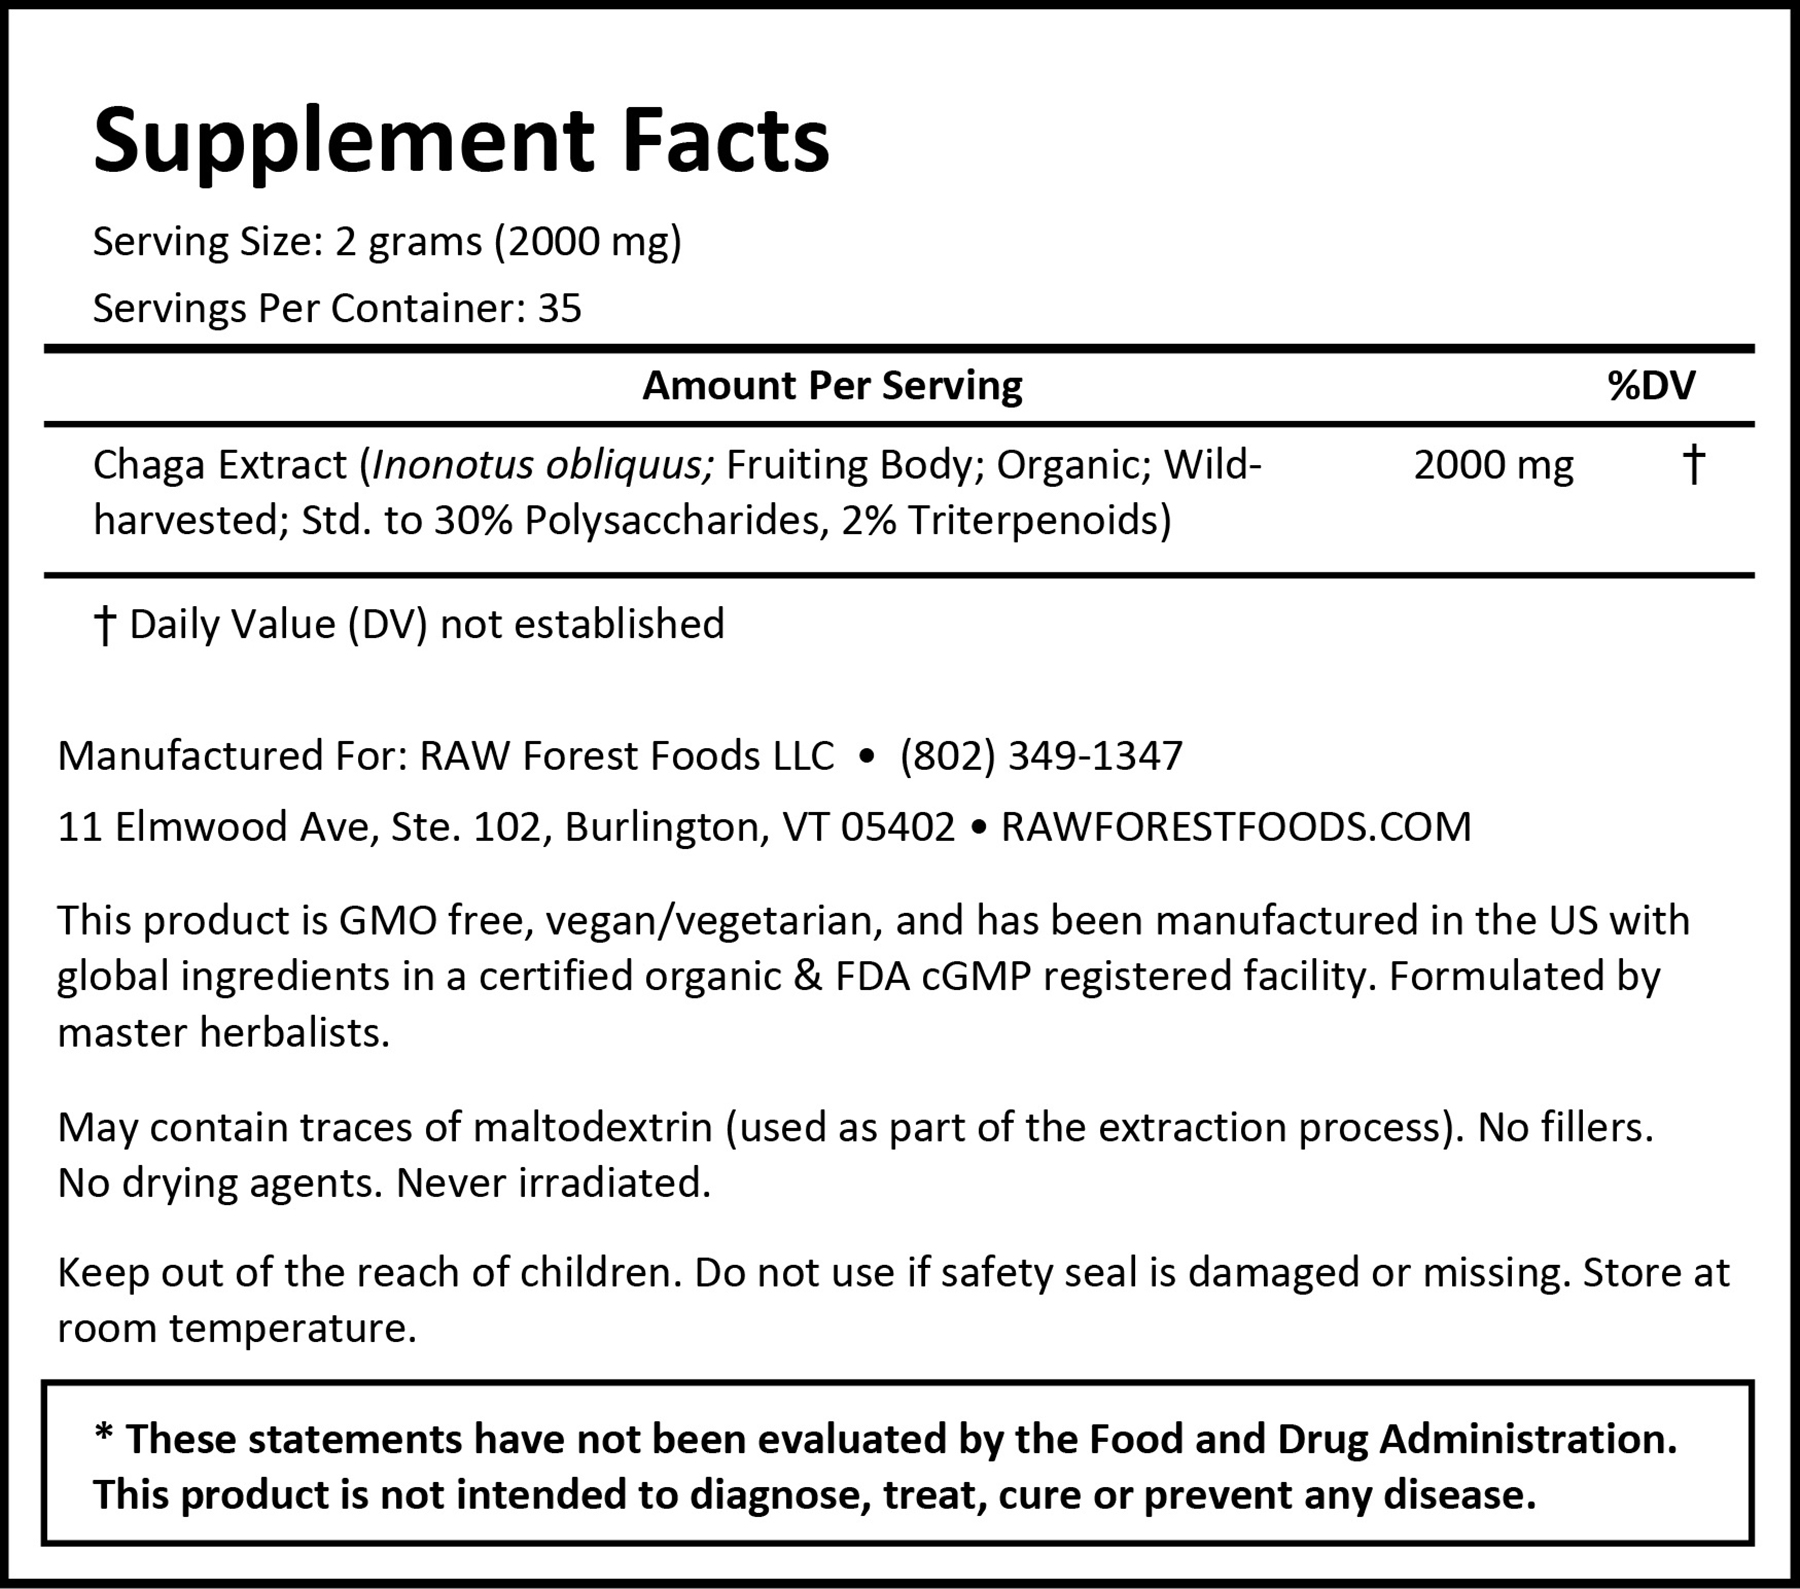 chaga-extract-powder-supplement-facts.jpg